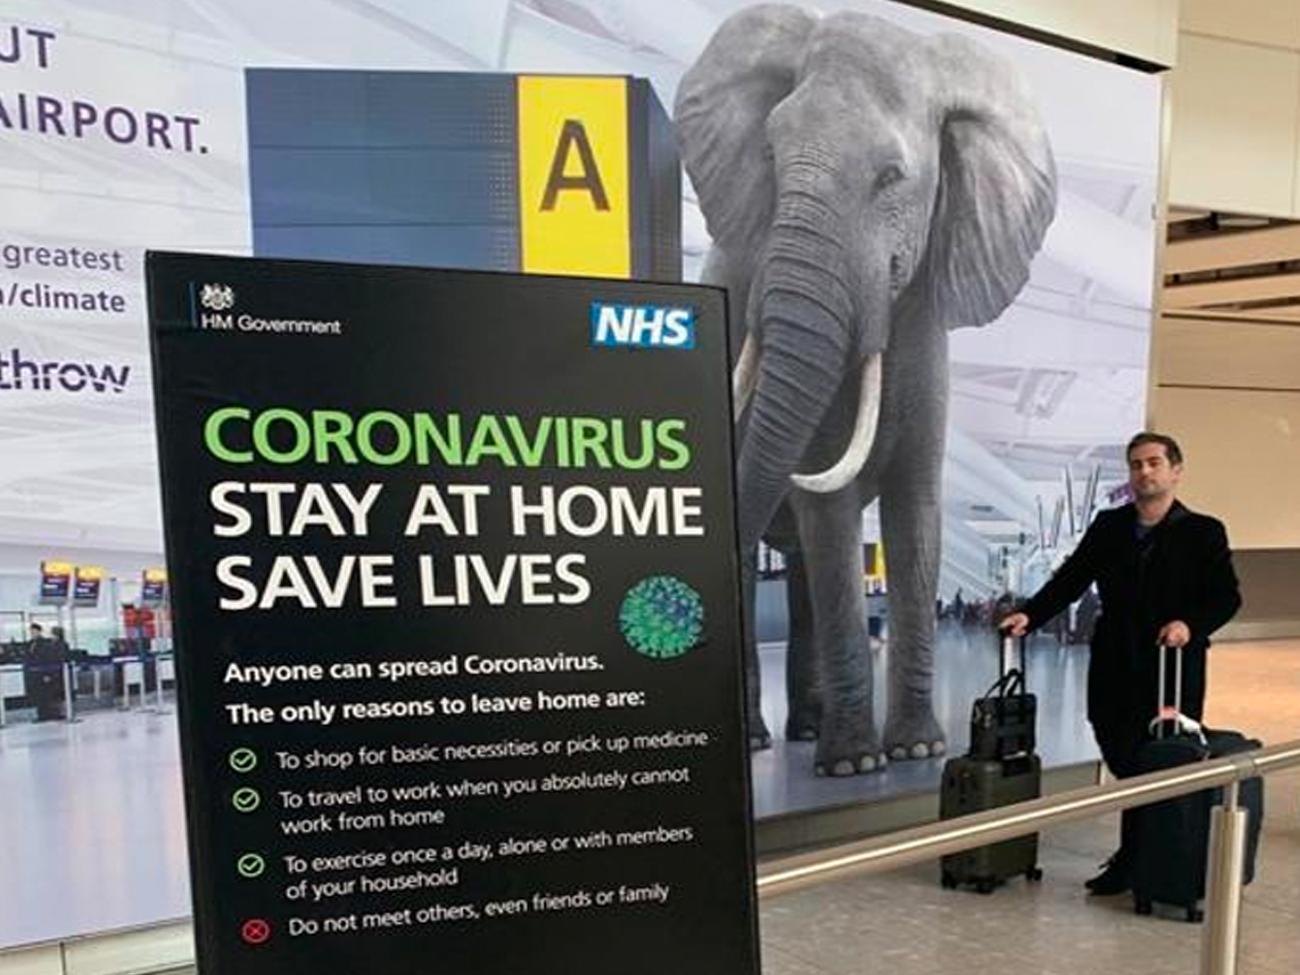 Airport arrivals covid-19 signage